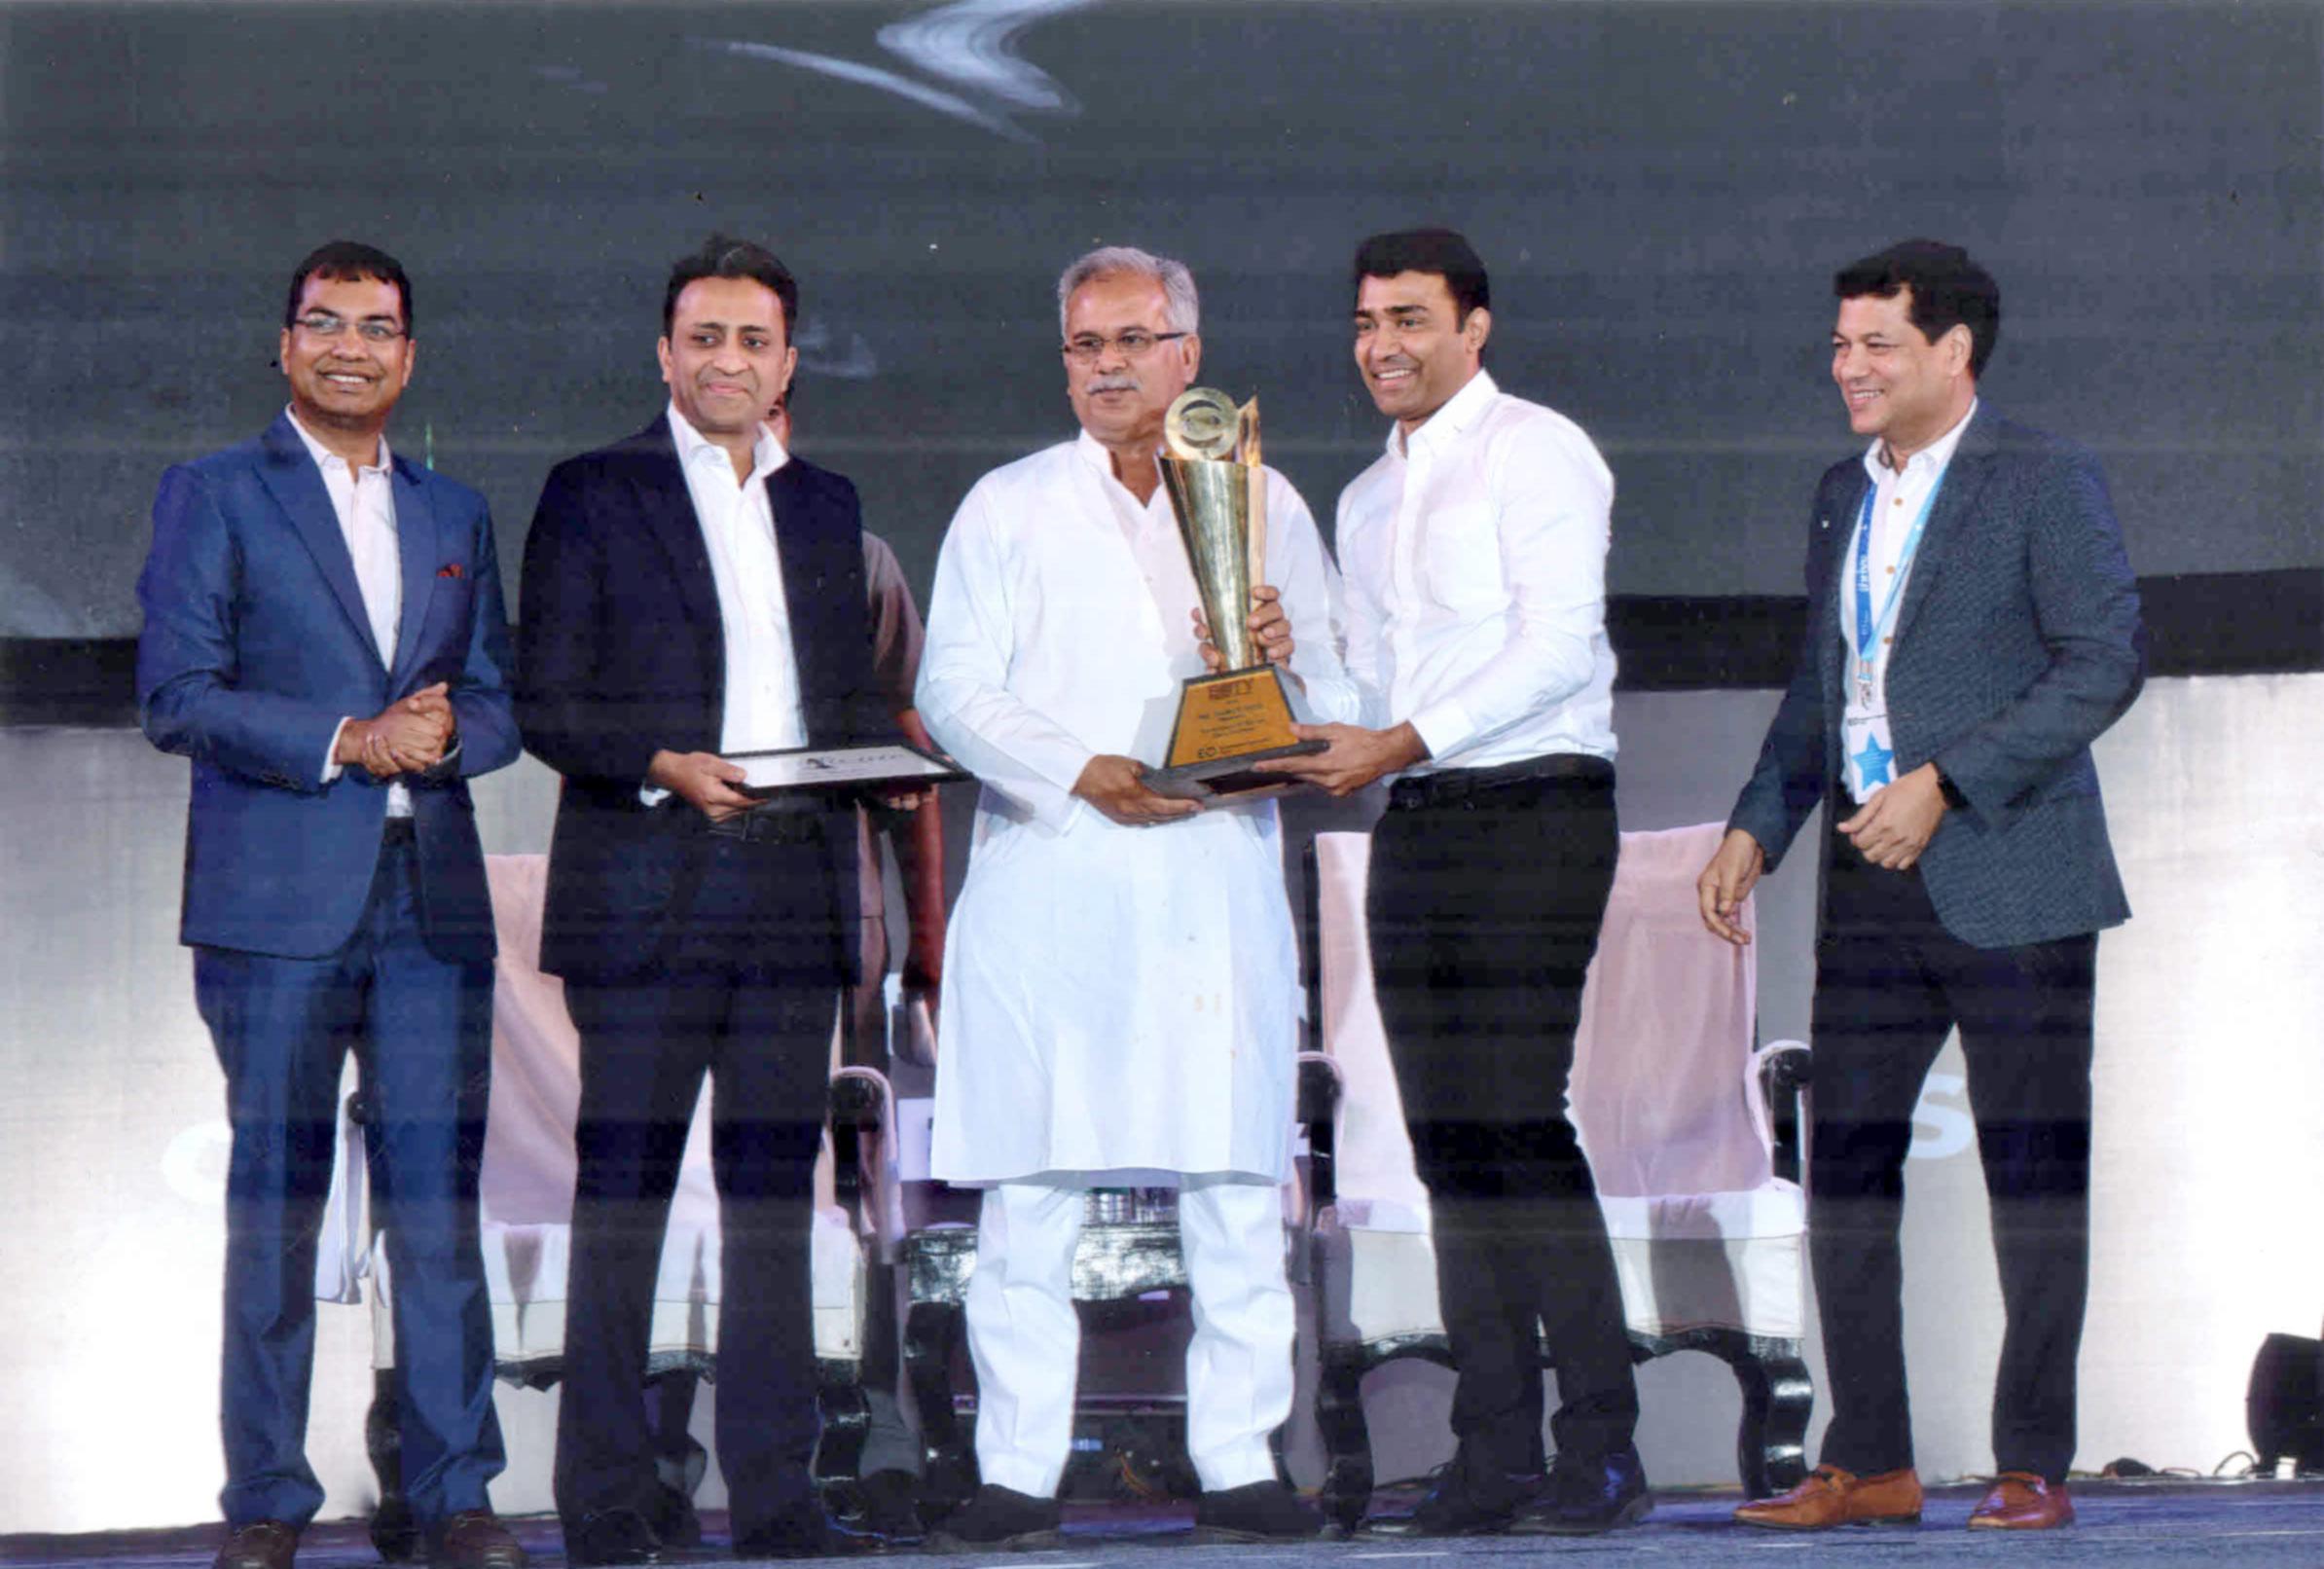 SteelMint Awards